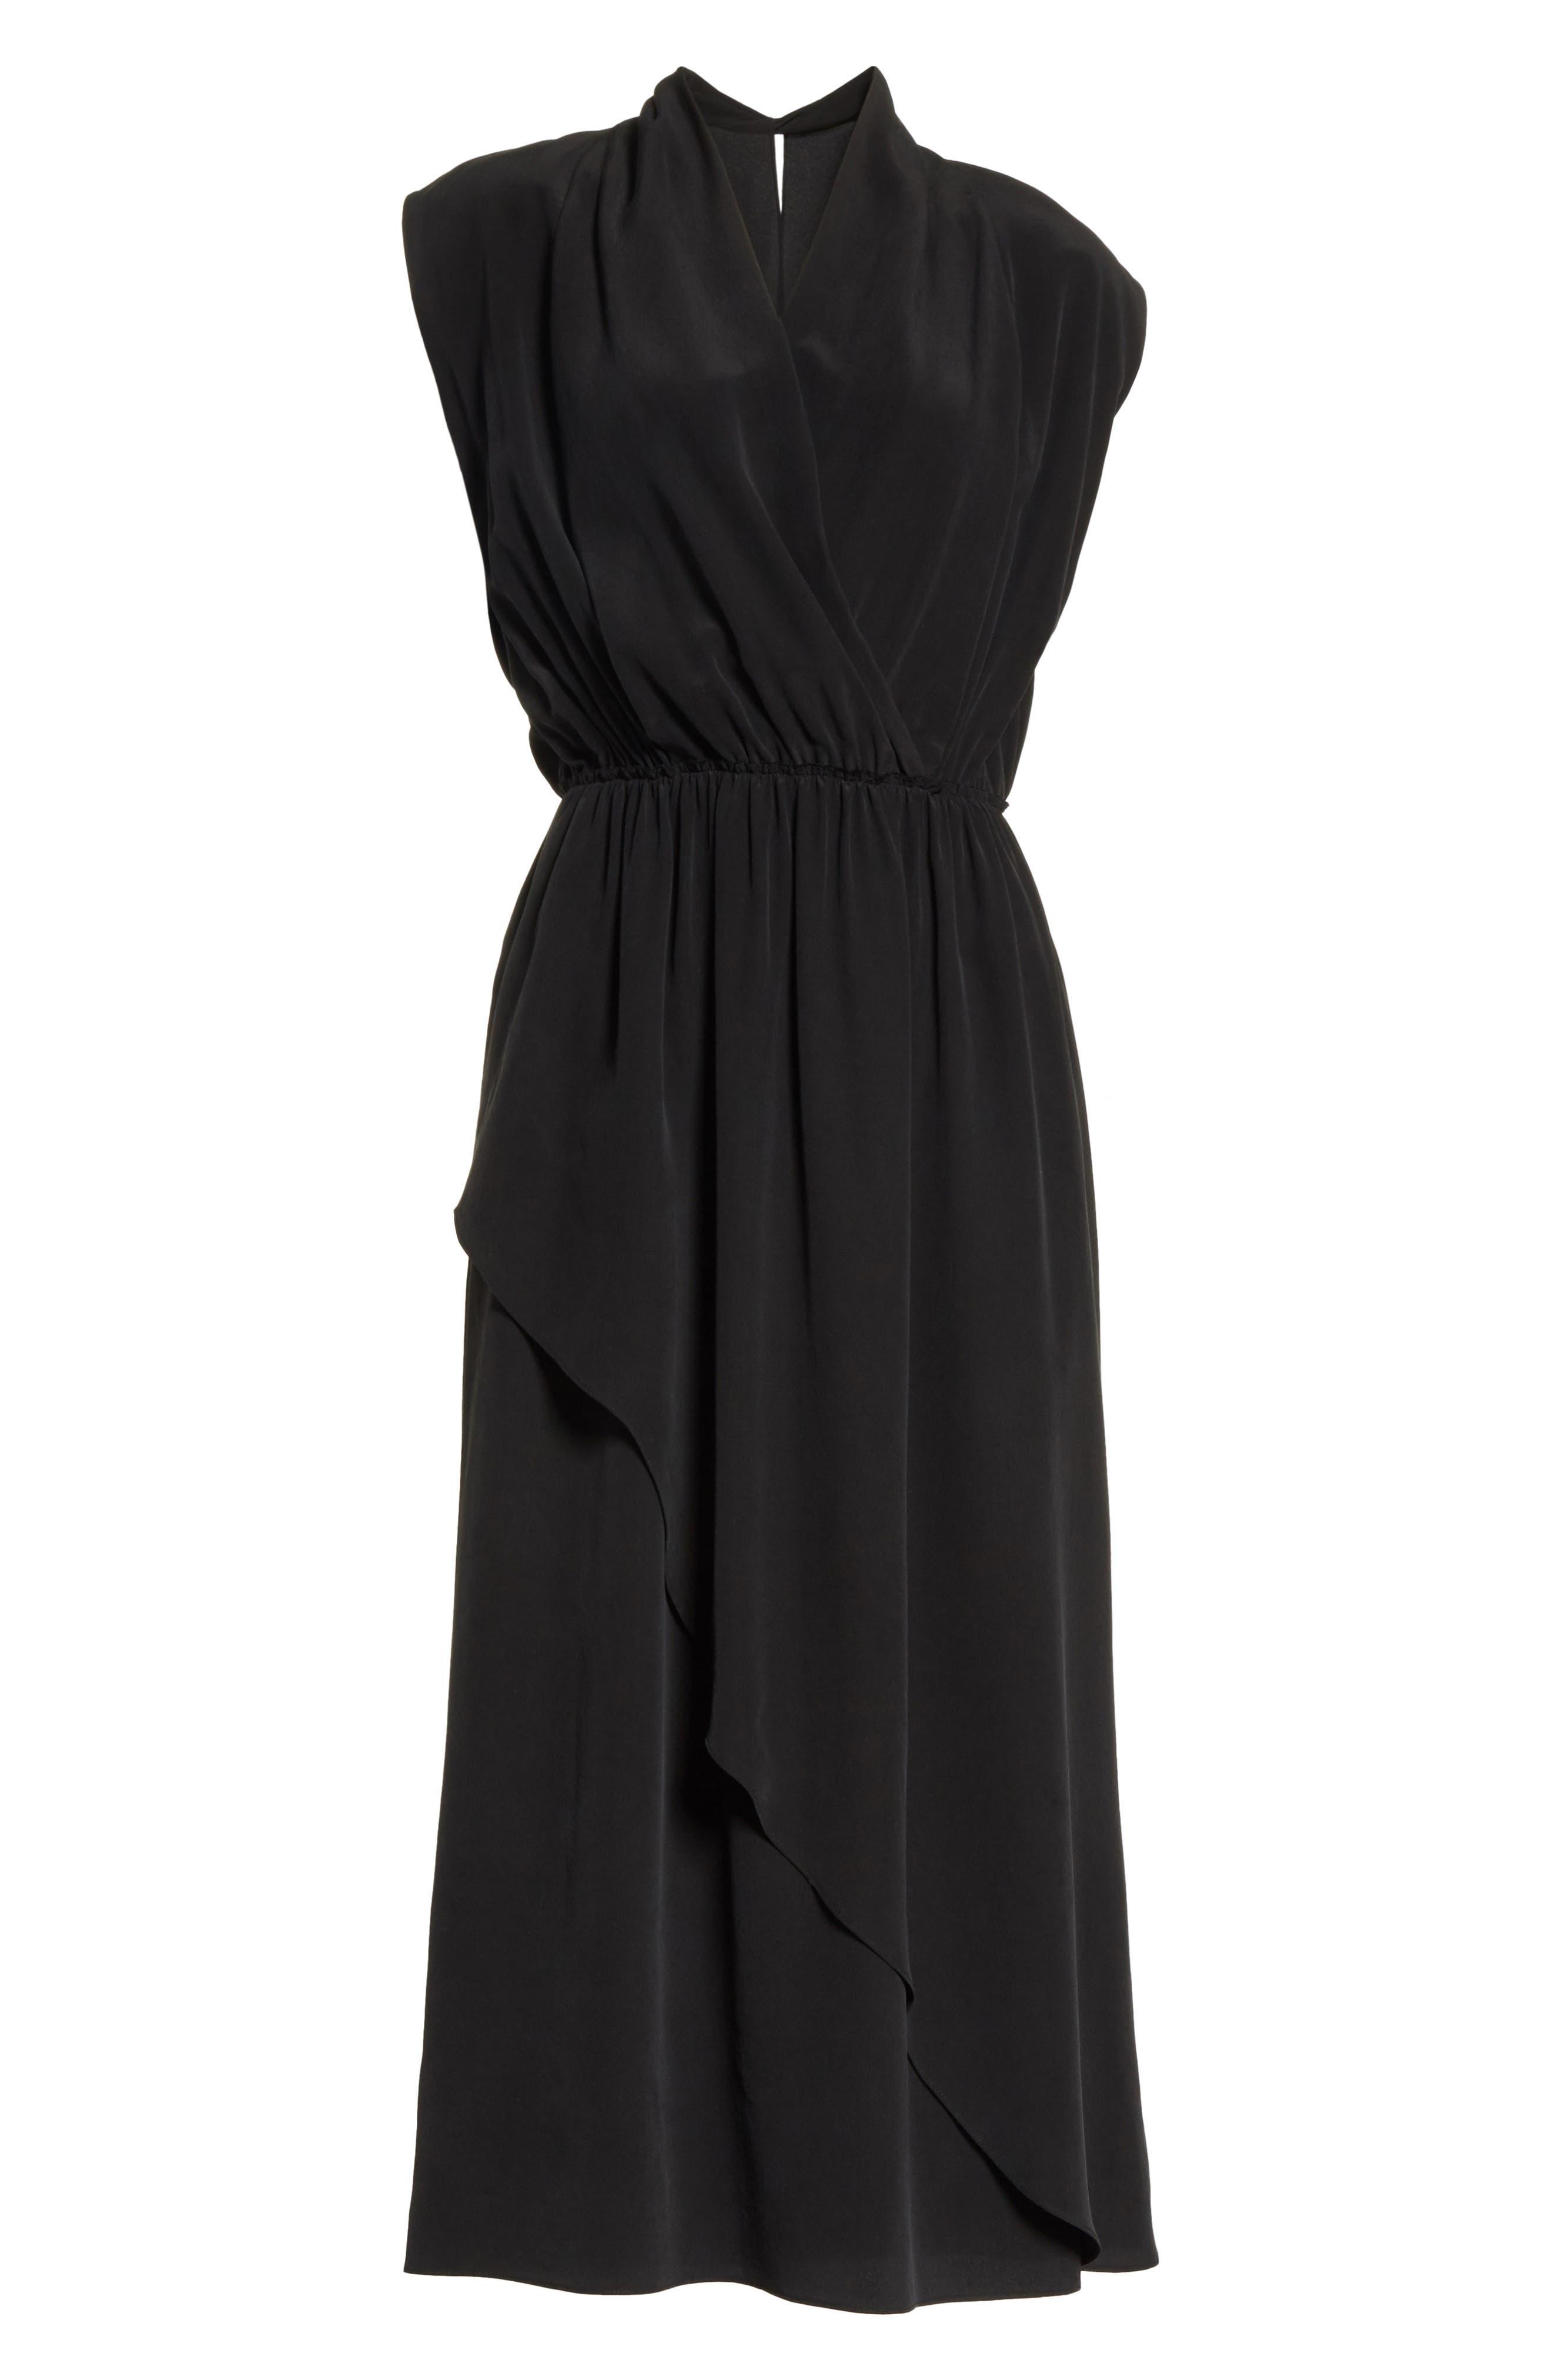 VINCE,                             Draped Silk Cross Front Dress,                             Alternate thumbnail 6, color,                             001